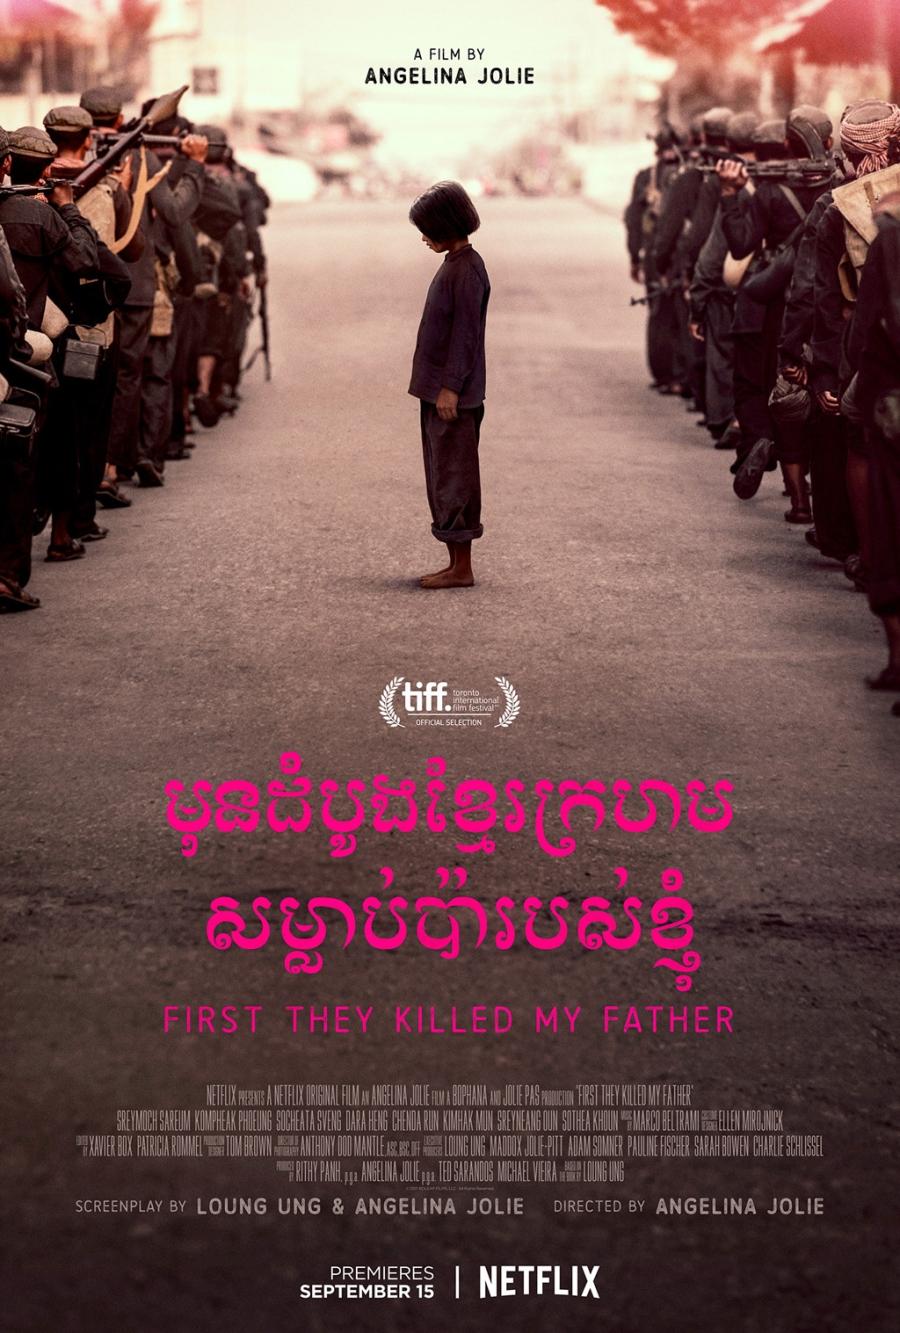 Phim moi cua Angelina Jolie va noi dau mang ten Khmer Do hinh anh 1